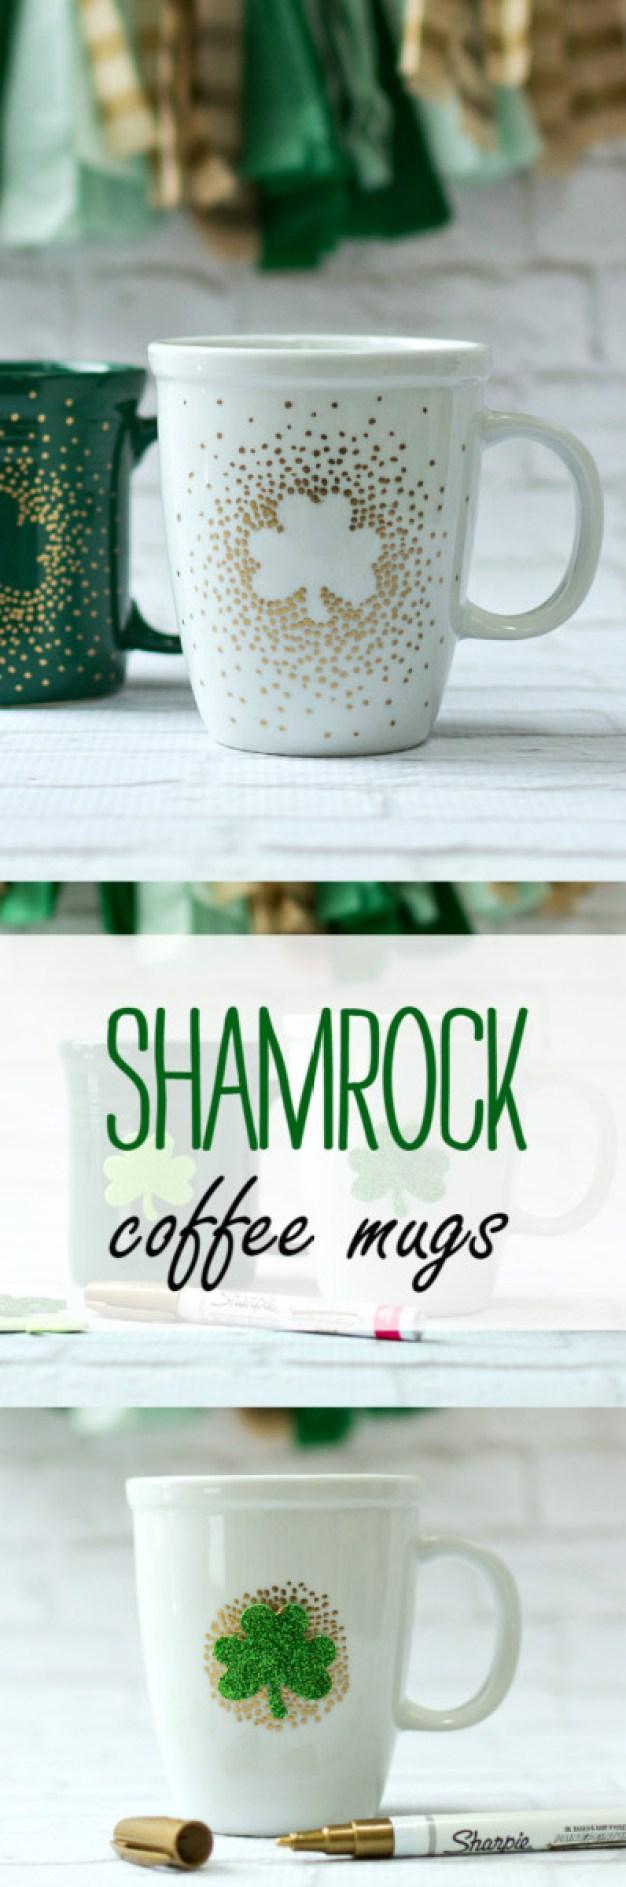 diy st patrick's day decorations -Irish Coffee Mugs